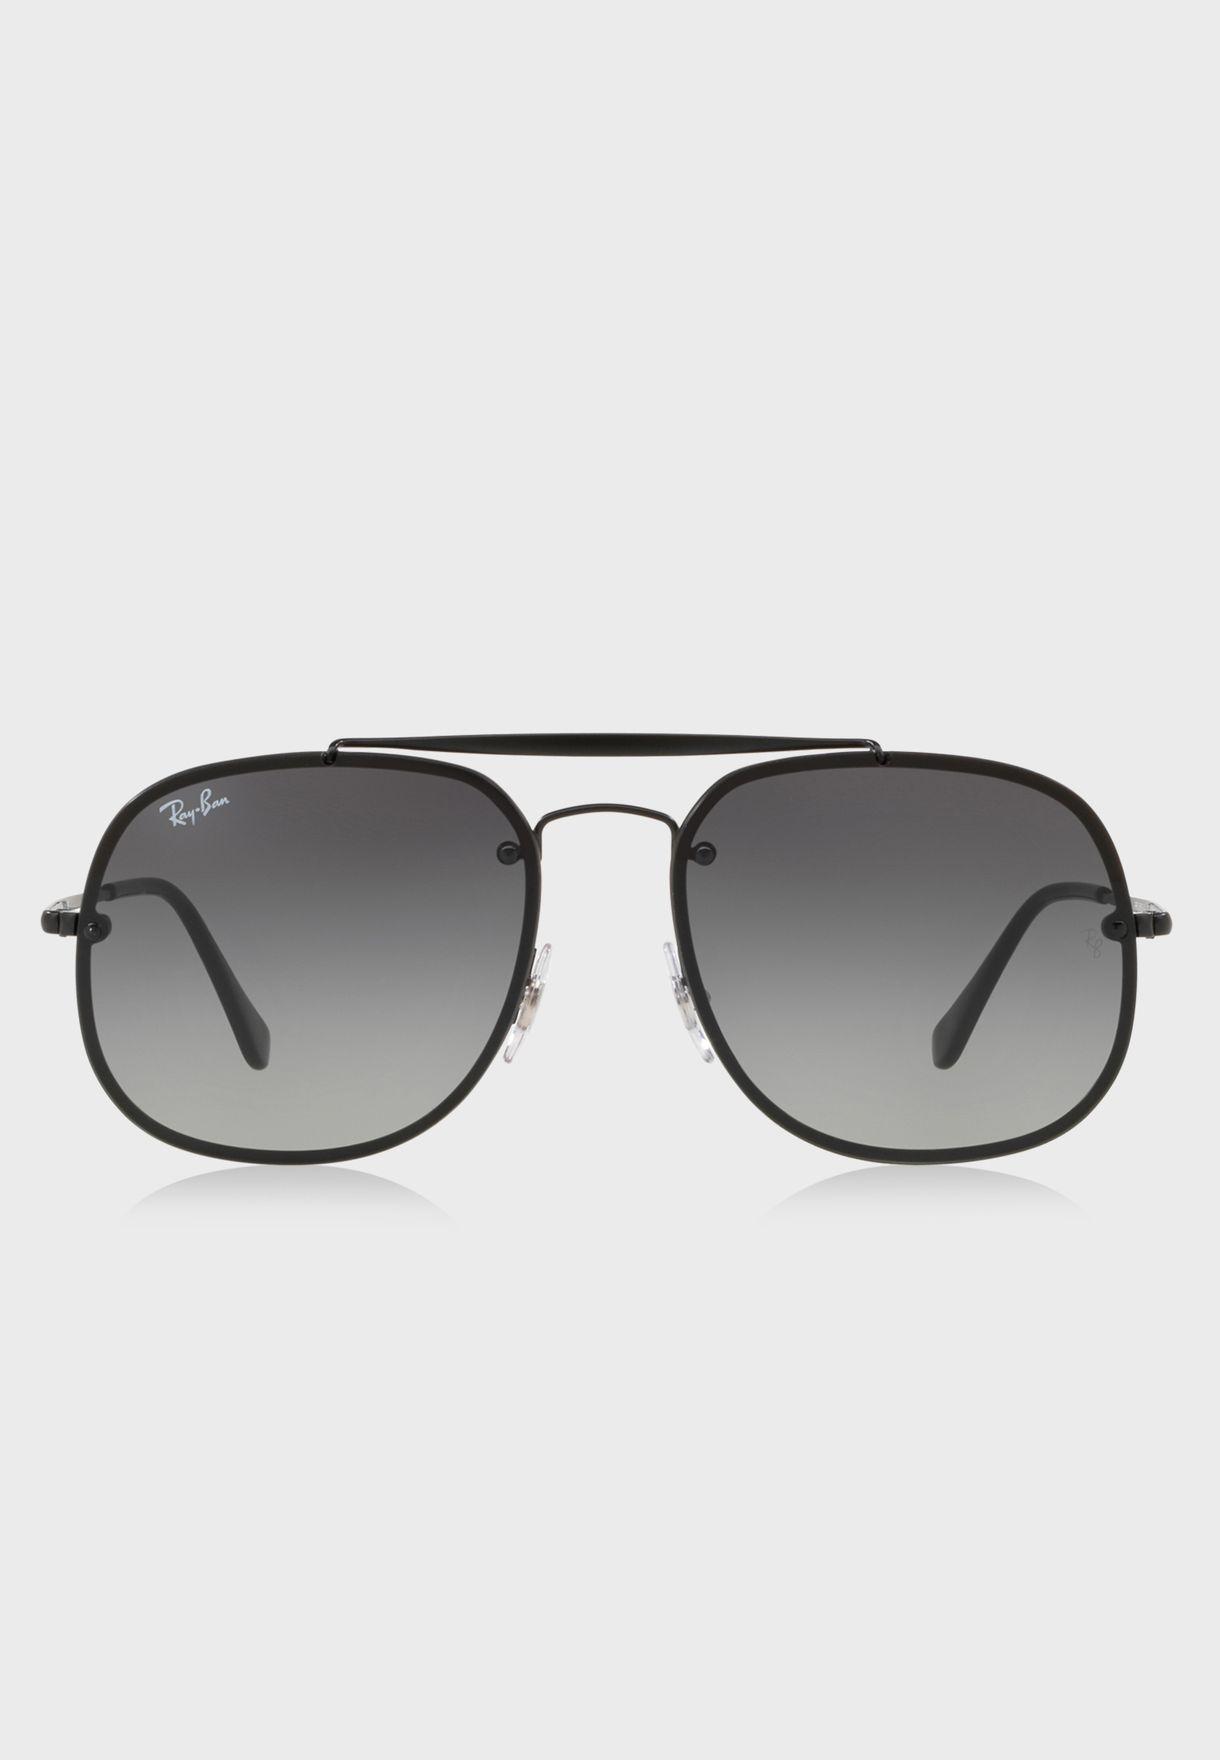 fd1ebb1cef Shop Ray-Ban black 0RB3583N Blaze General Sunglasses 8053672866575 ...